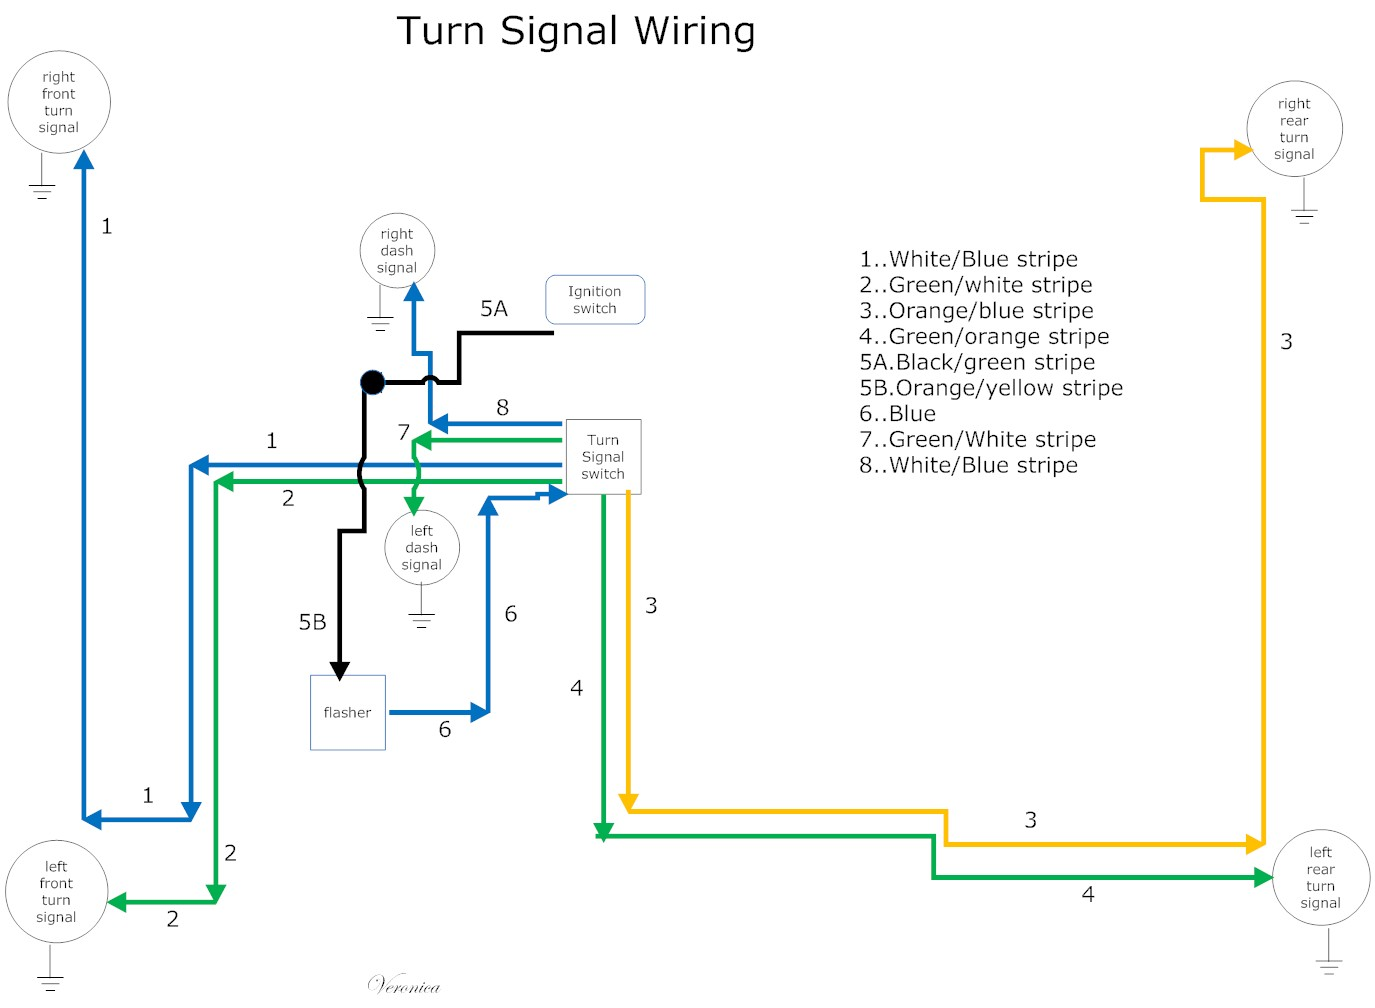 small resolution of 2012 jeep wrangler turn signal wiring diagram somurich com rh somurich com jeep cj7 turn signal